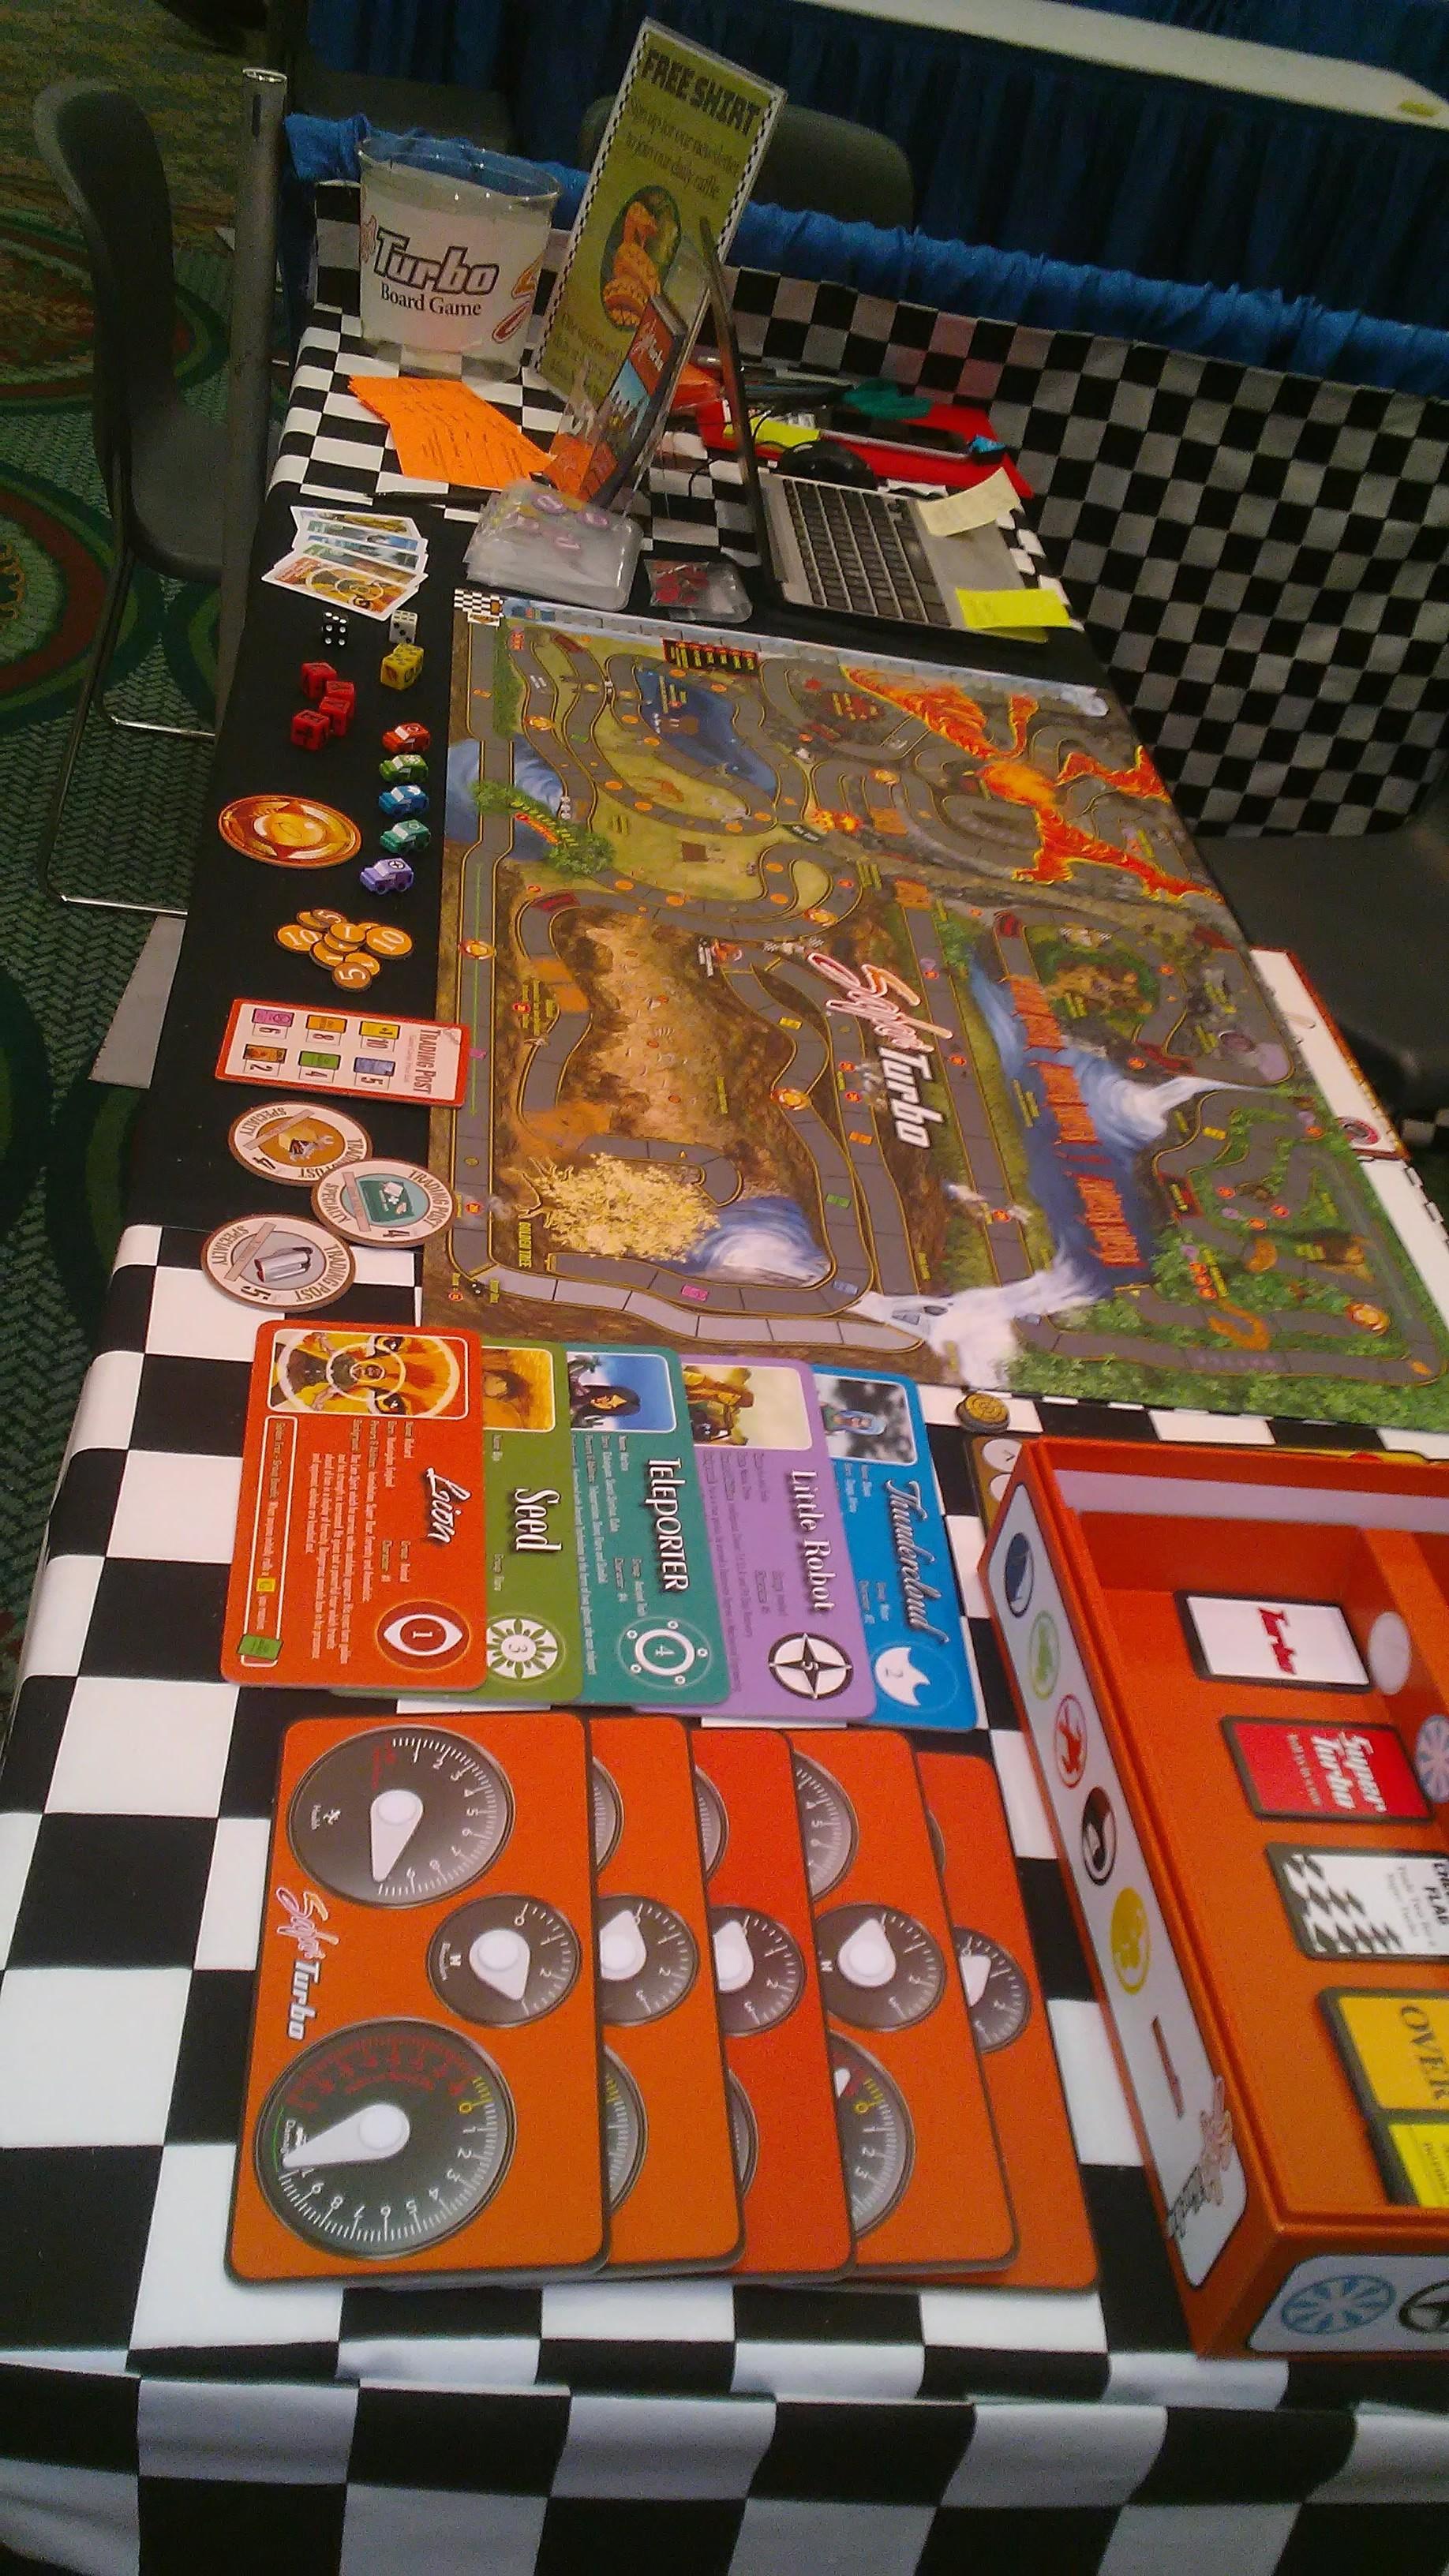 Safari Turbo game components